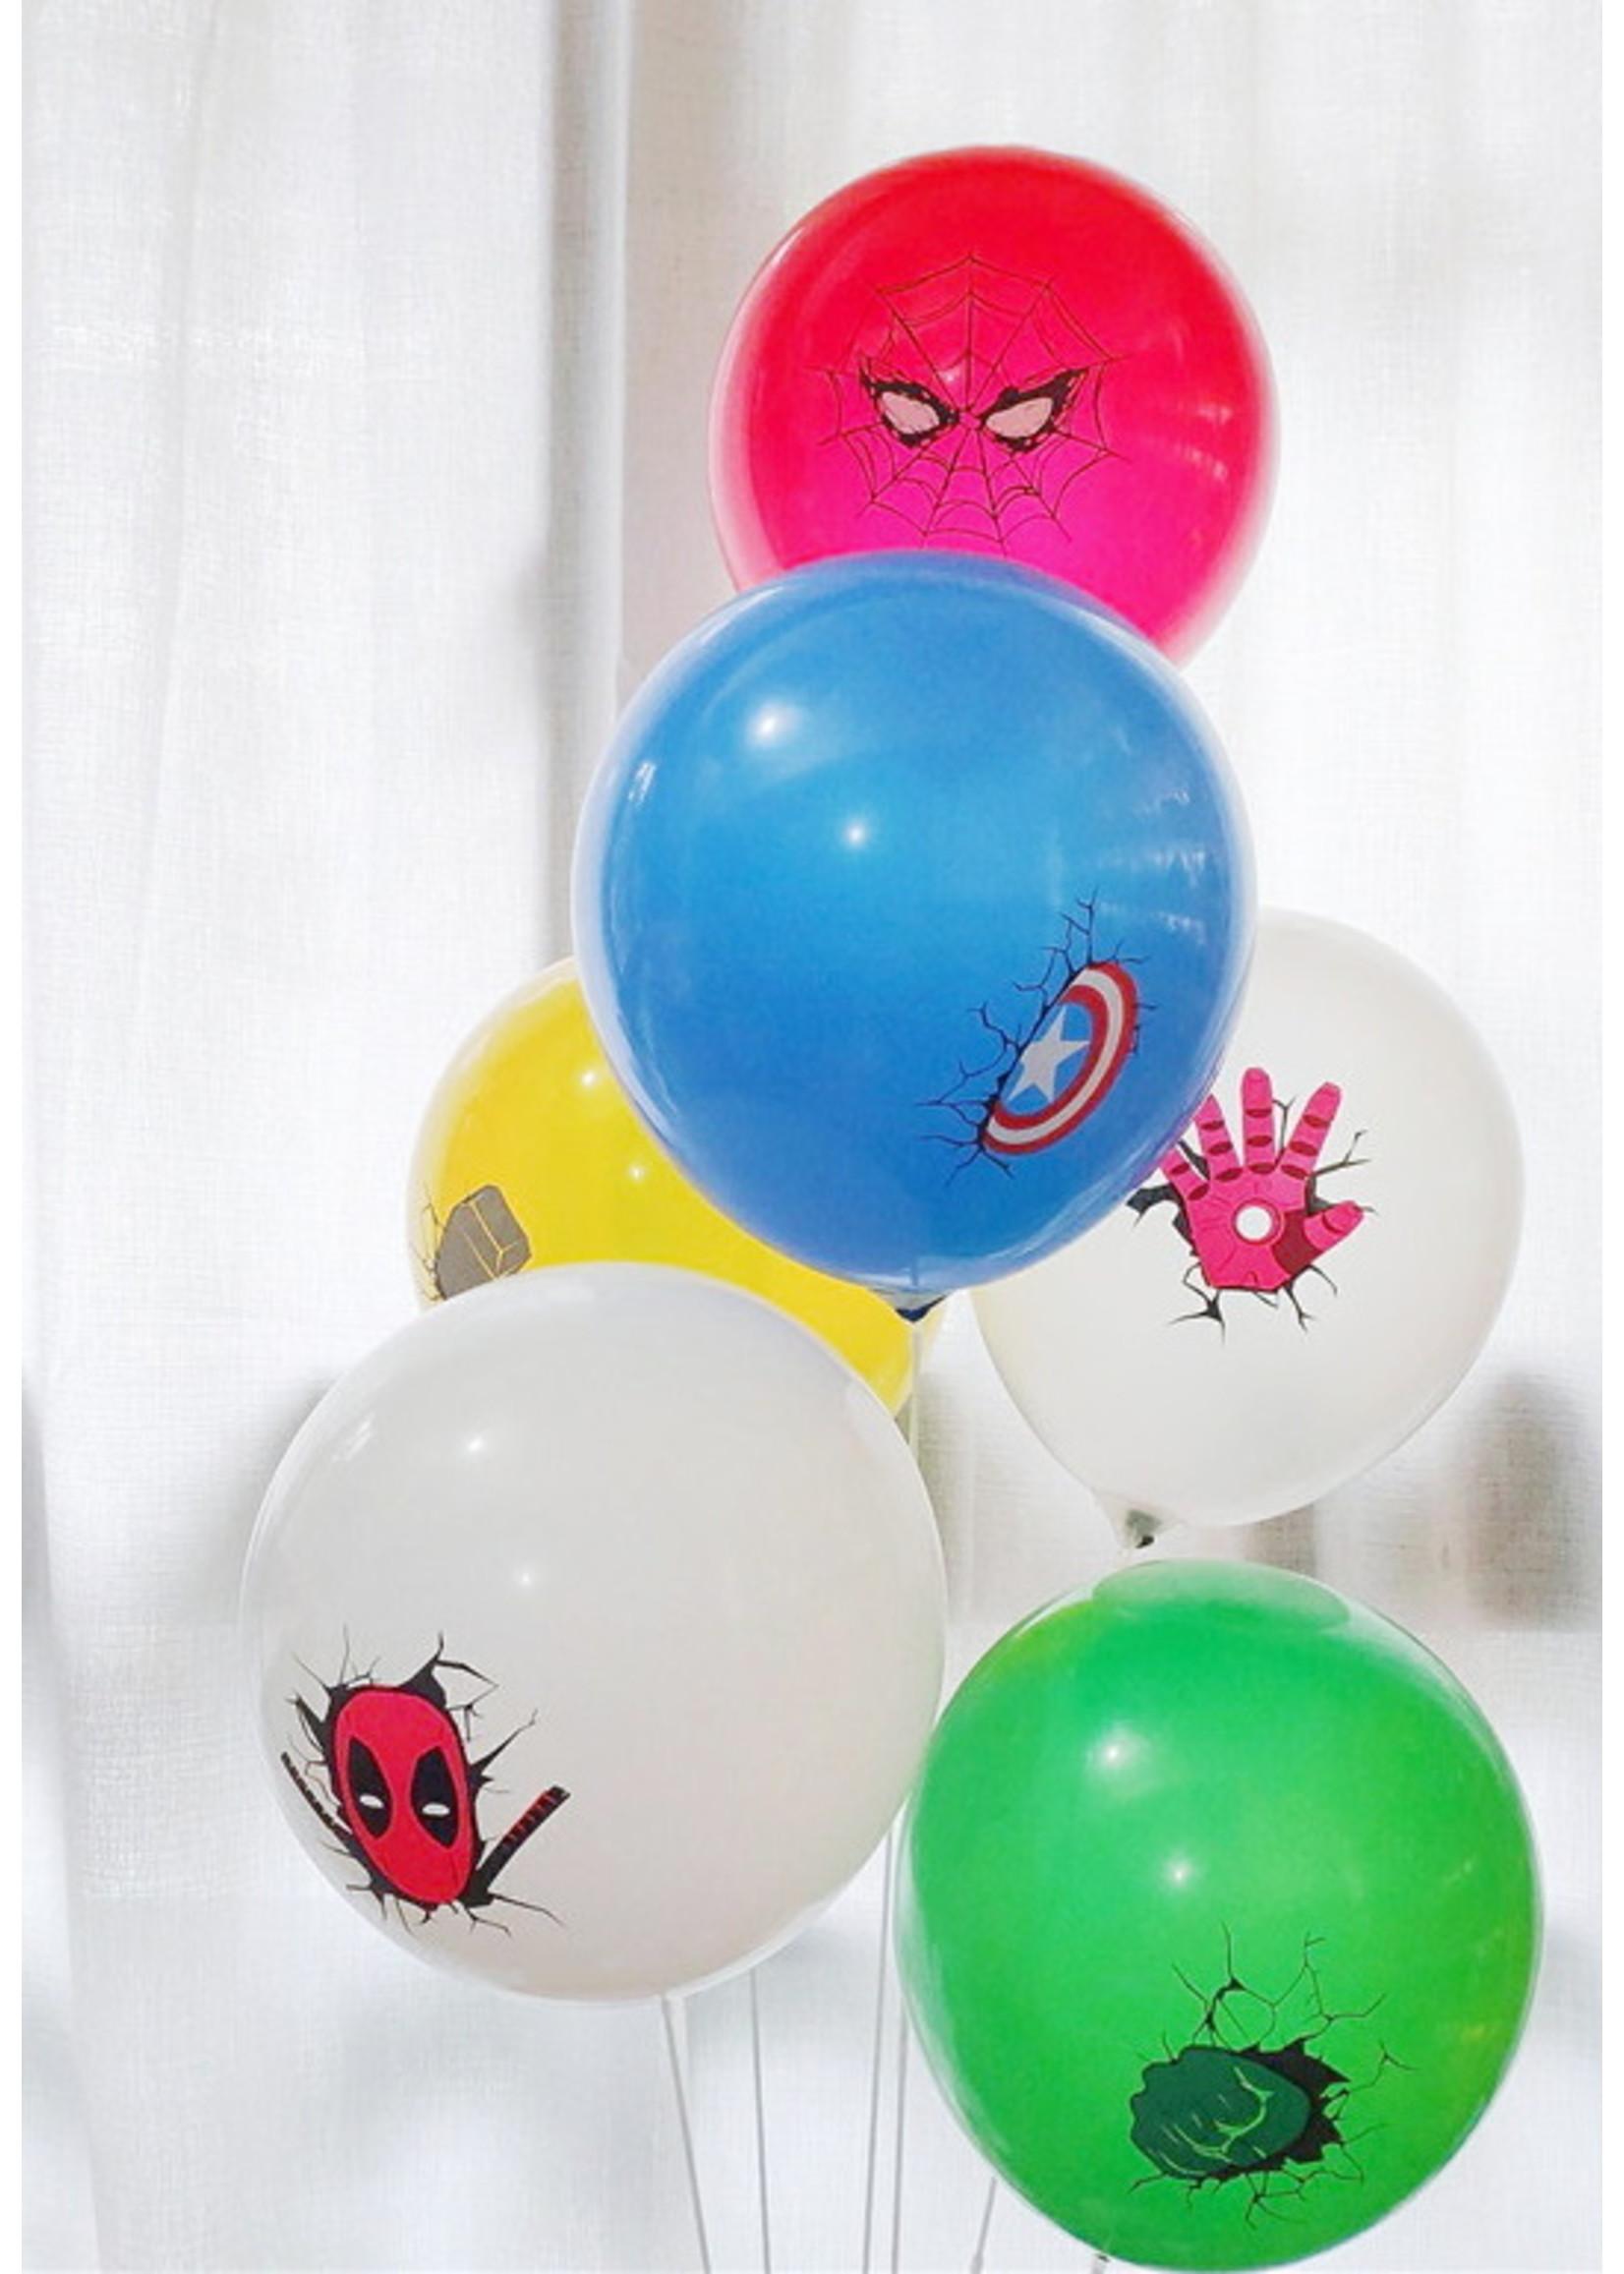 Annienas super hero ballon